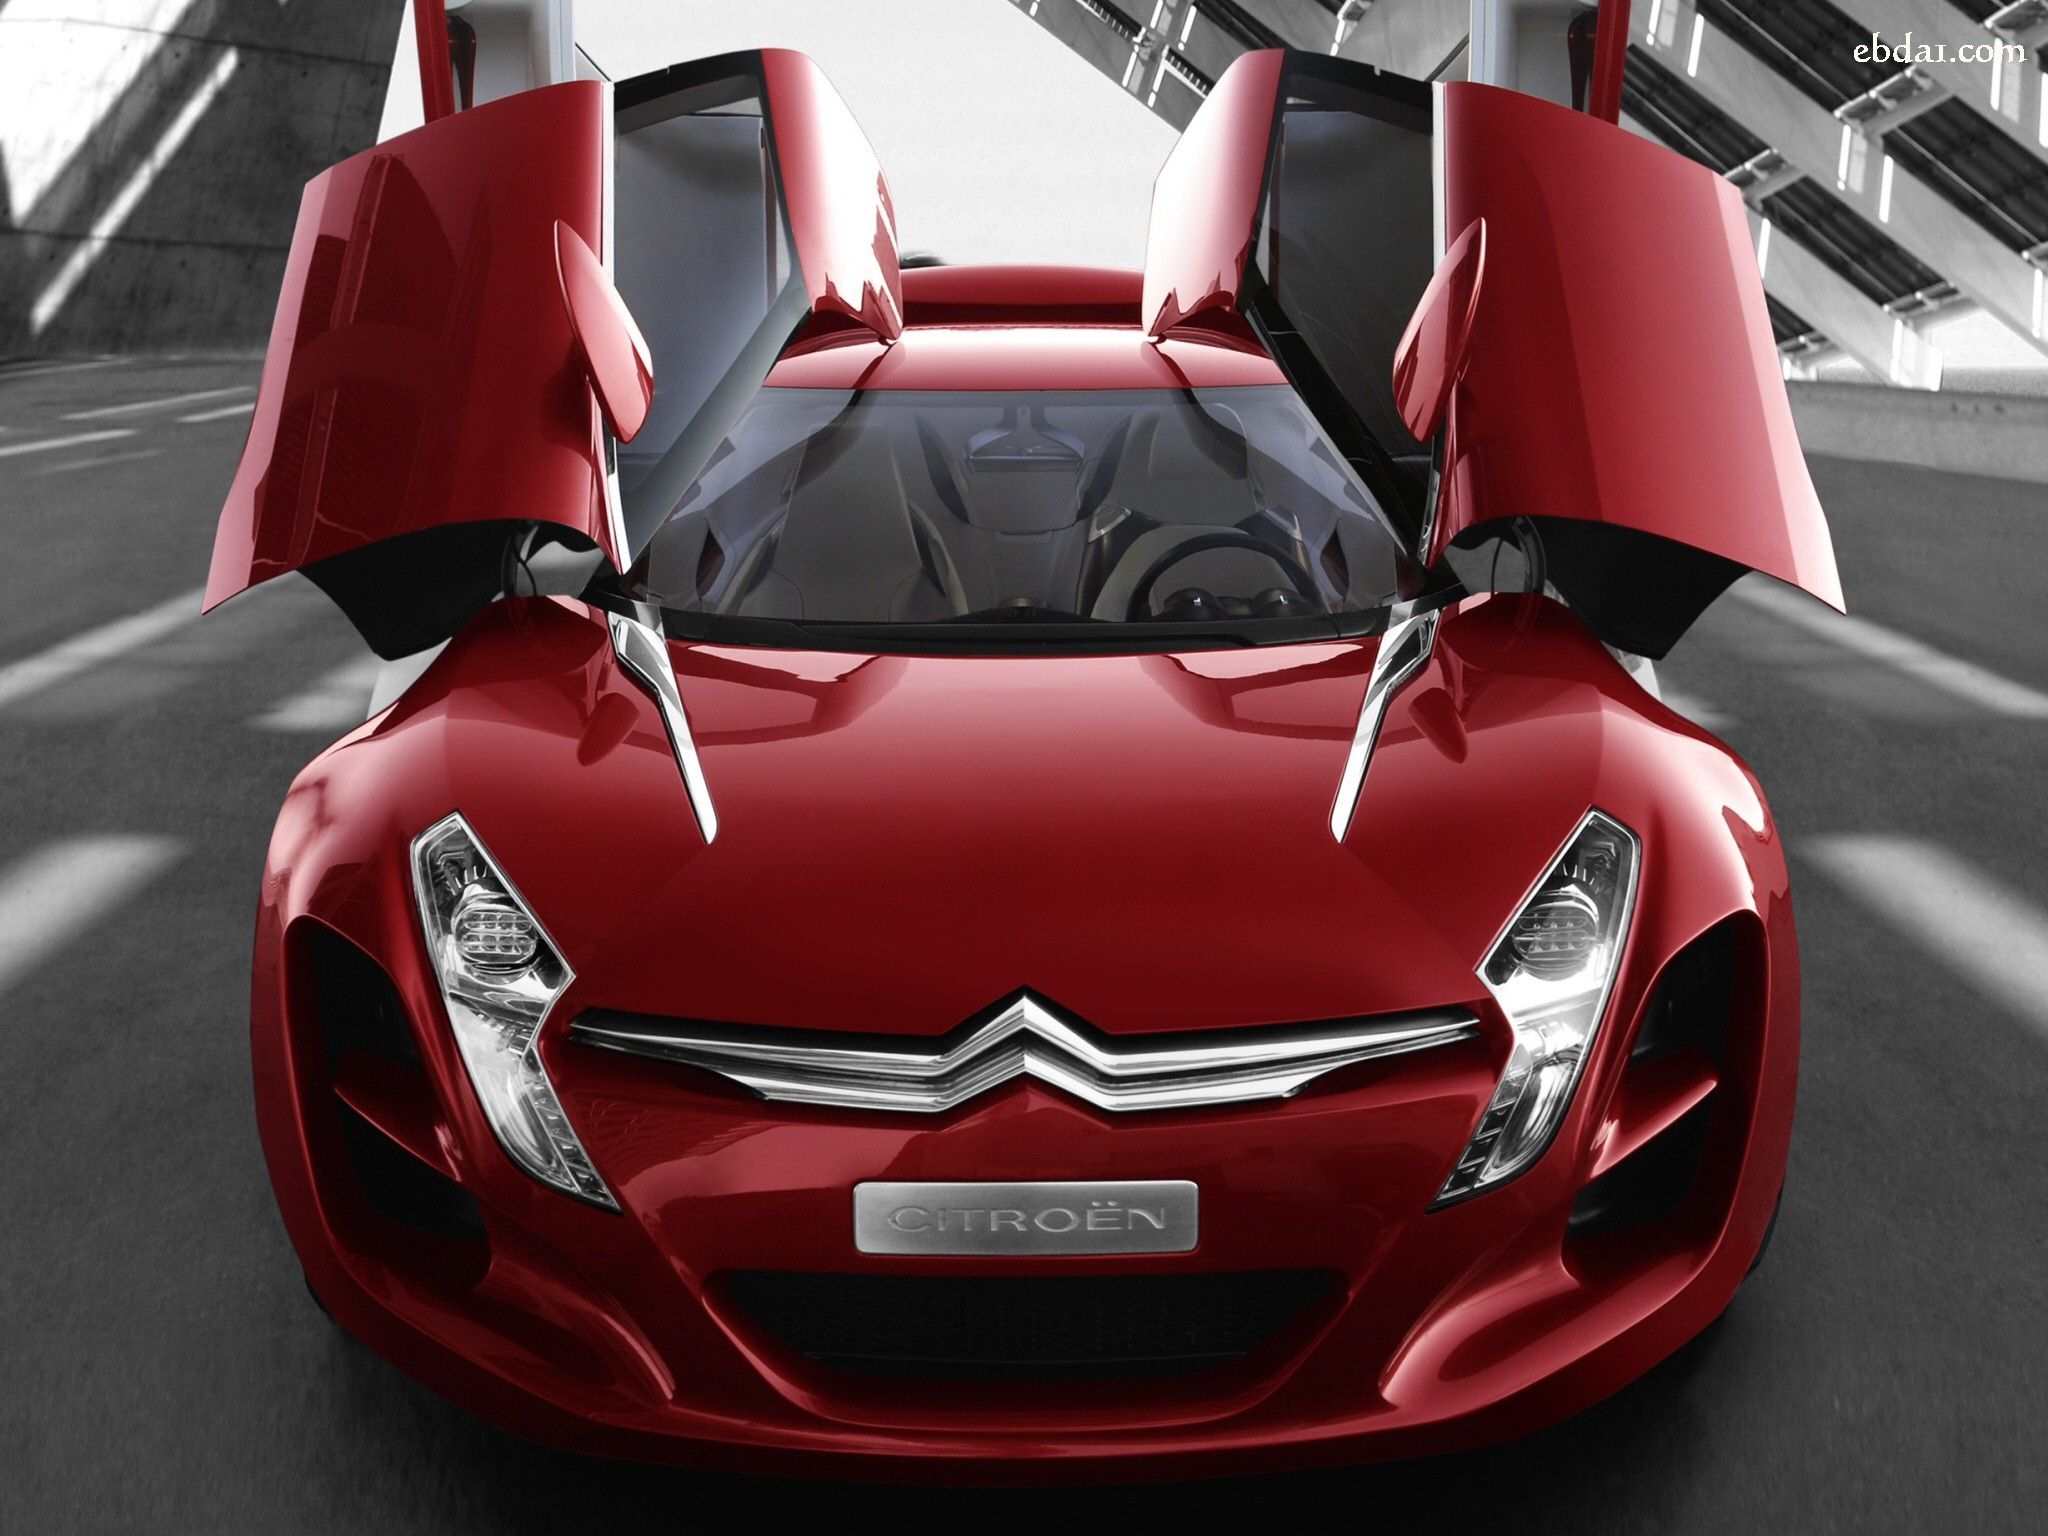 اجمل سيارات2015 5b6f17dcbce0e0461920